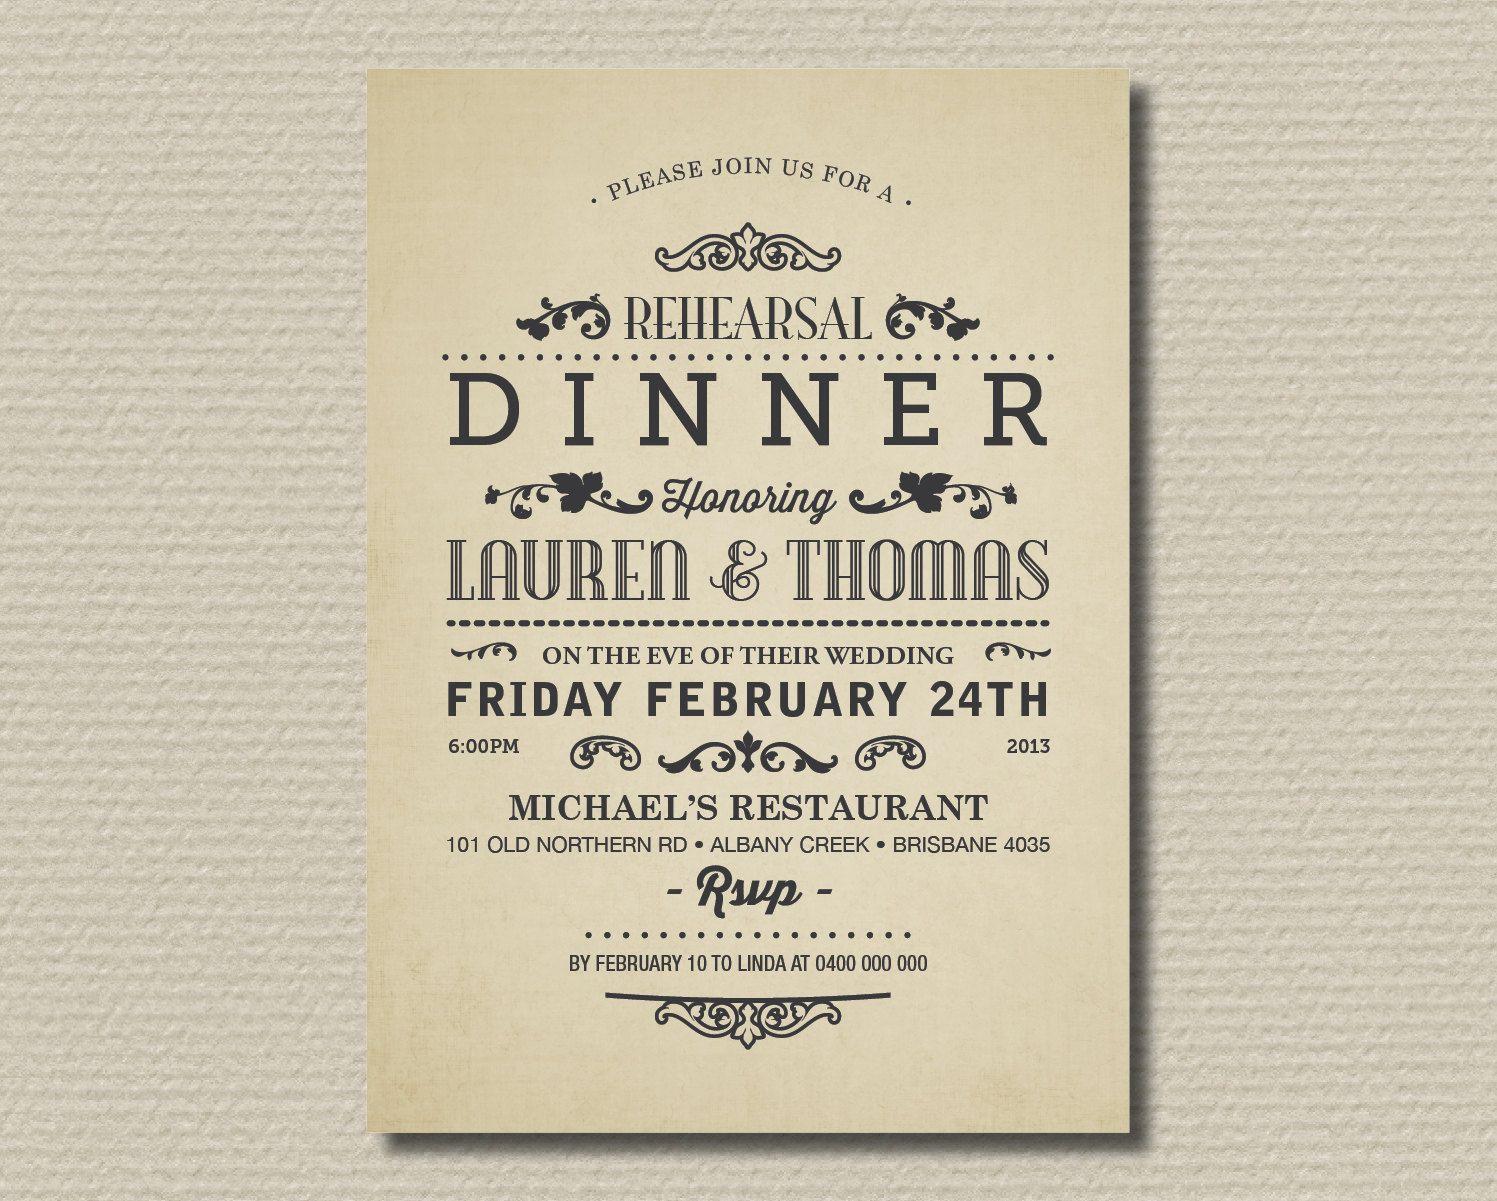 Vintage Poster Layout Via Etsy Birthday Dinner Invitation Wedding Rehearsal Invitations